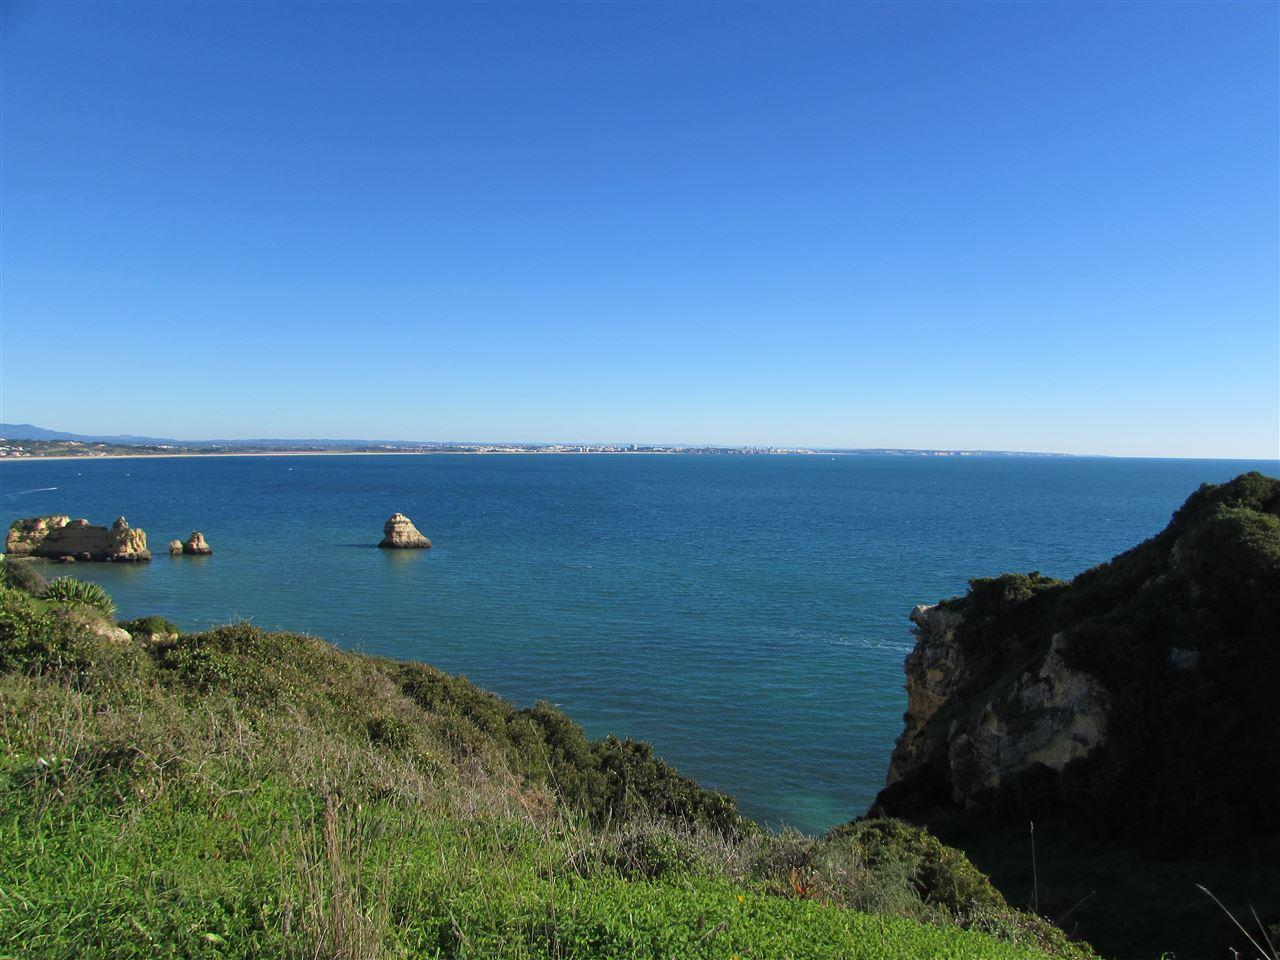 Land for Sale at Terreno com ruina for Sale Lagos, Algarve, Portugal